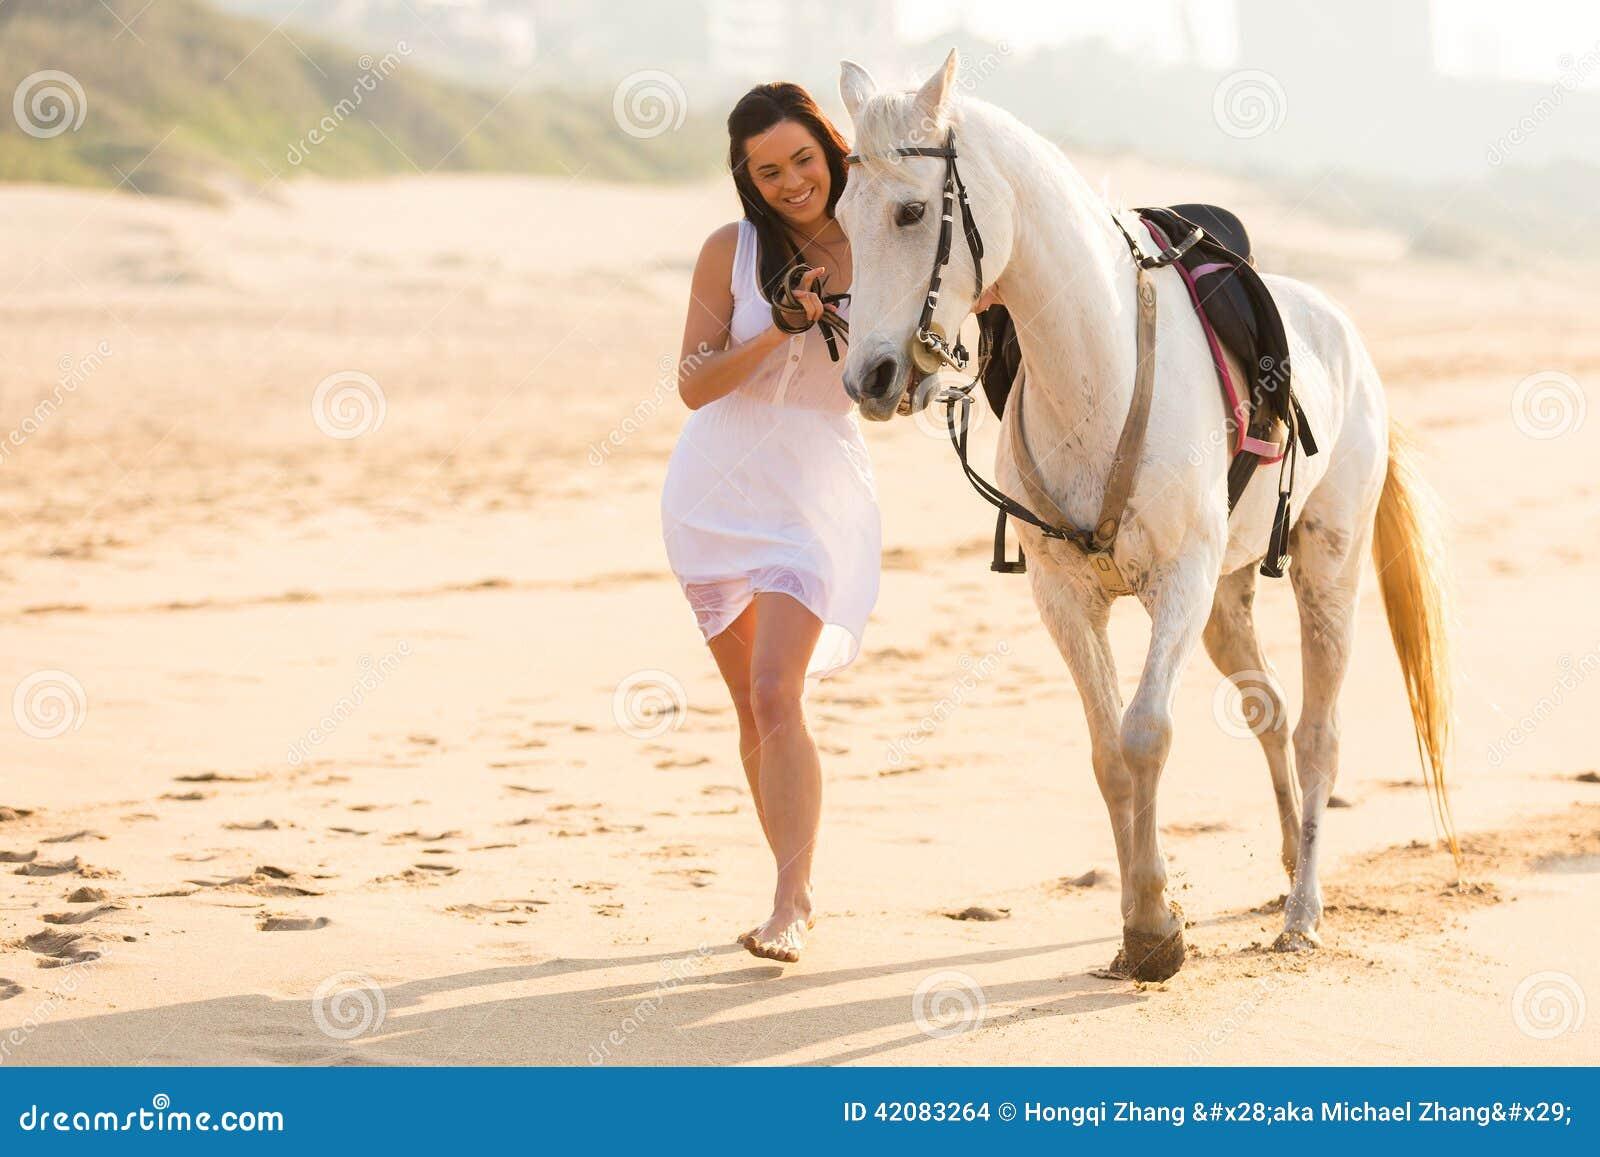 white horse beach single jewish girls Hot jewish girls/sexy jewish women come in all shapes and sizes celebrities the most beautiful jewish women under 40 greg stopera.